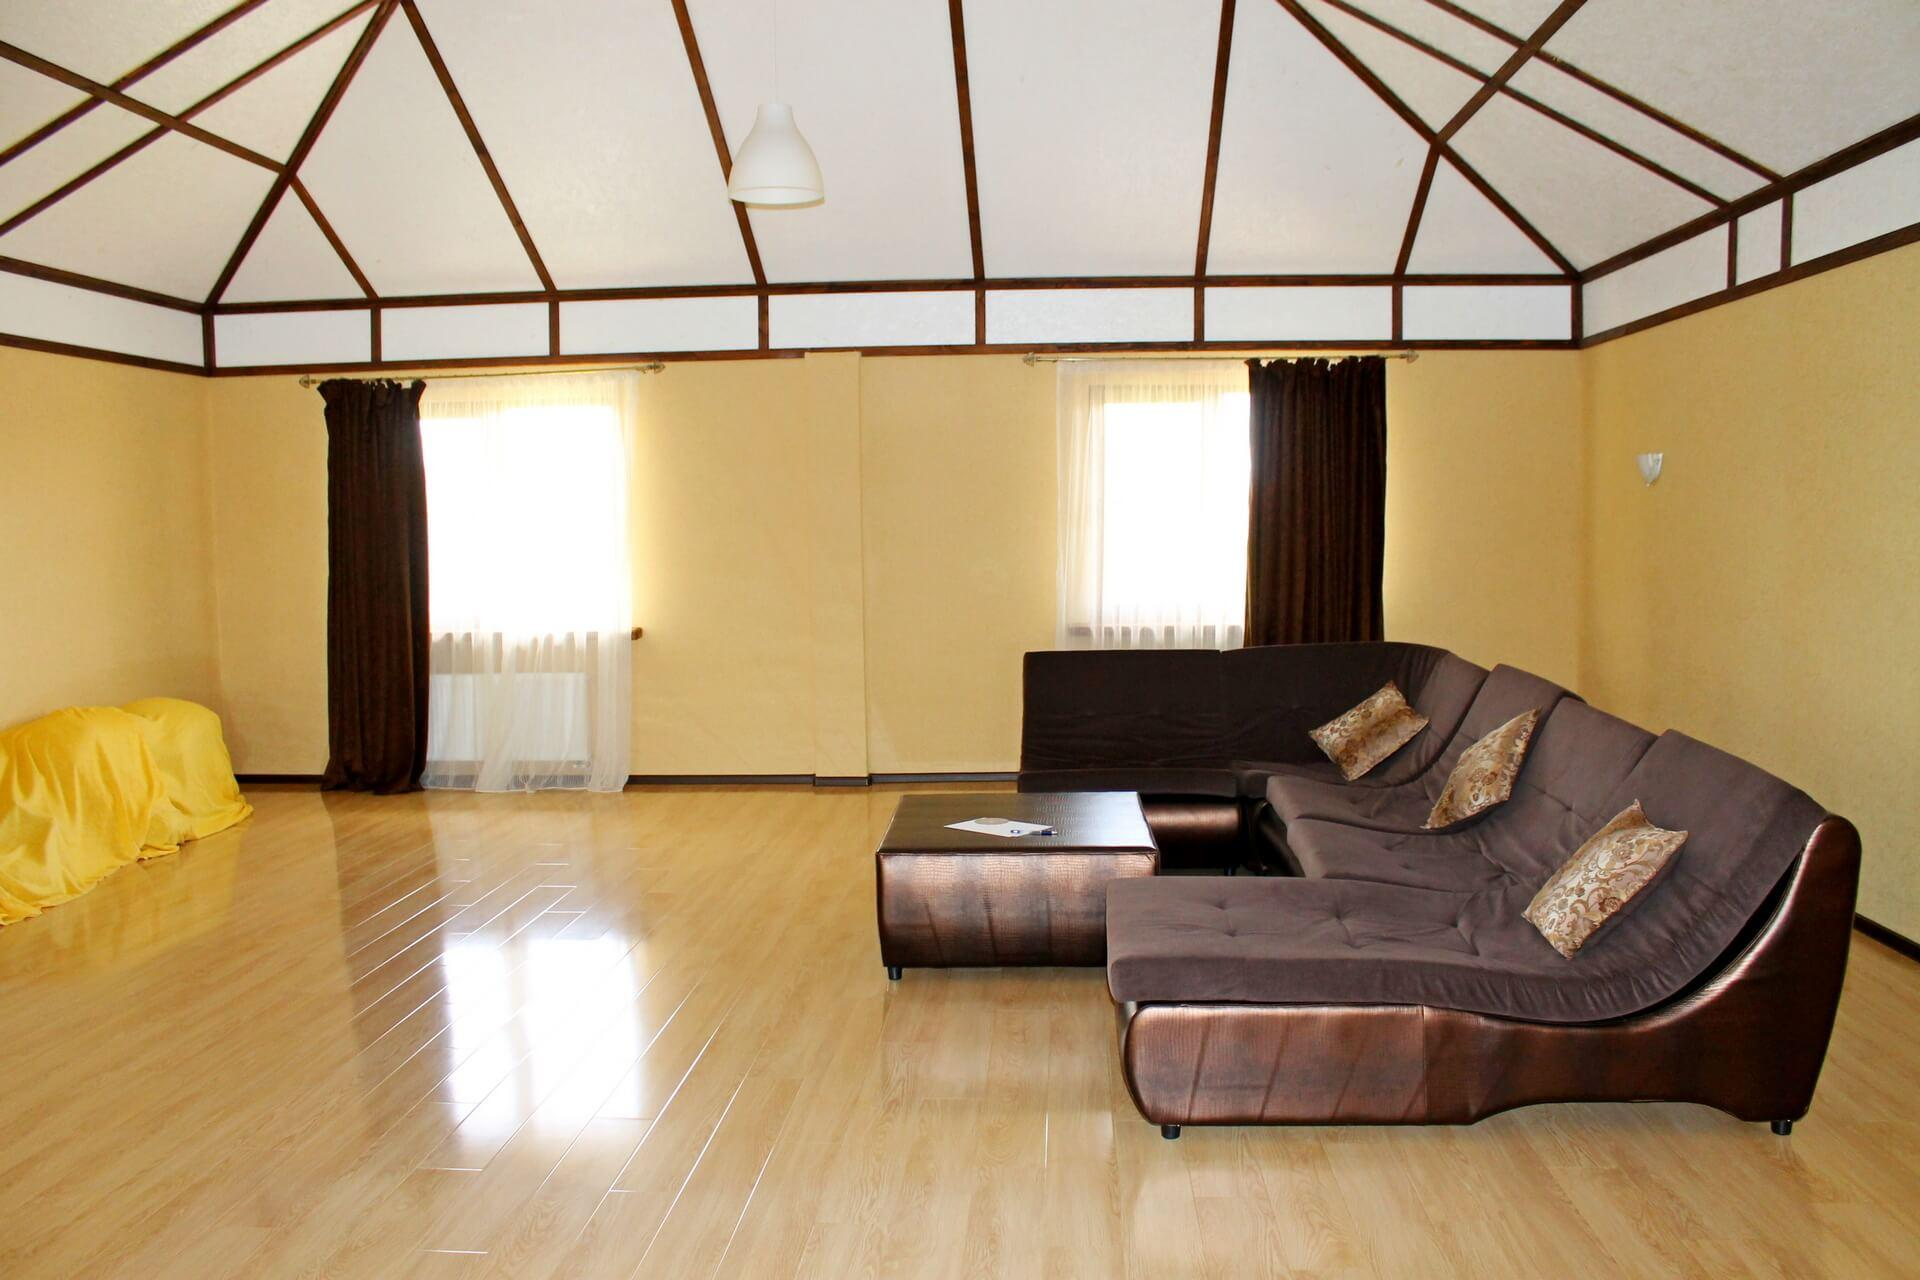 Гостевой дом на улице Веселая - image Gostevoj-dom-v-Adlere on http://bizneskvartal.ru